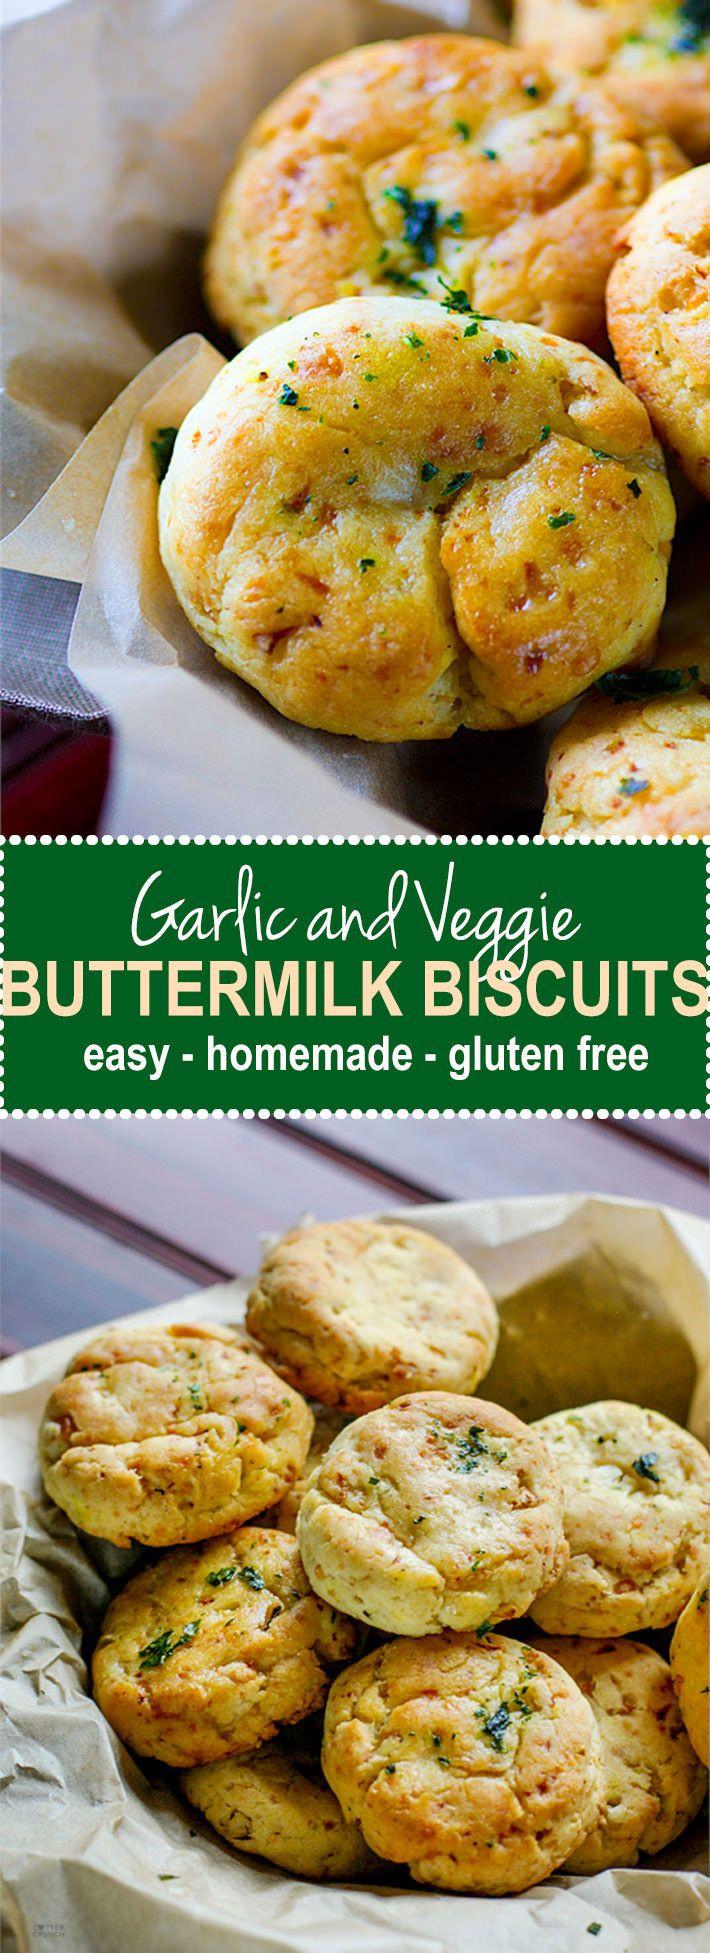 Gluten Free Buttermilk Recipes  Healthy Recipes Easy Homemade Gluten Free Buttermilk